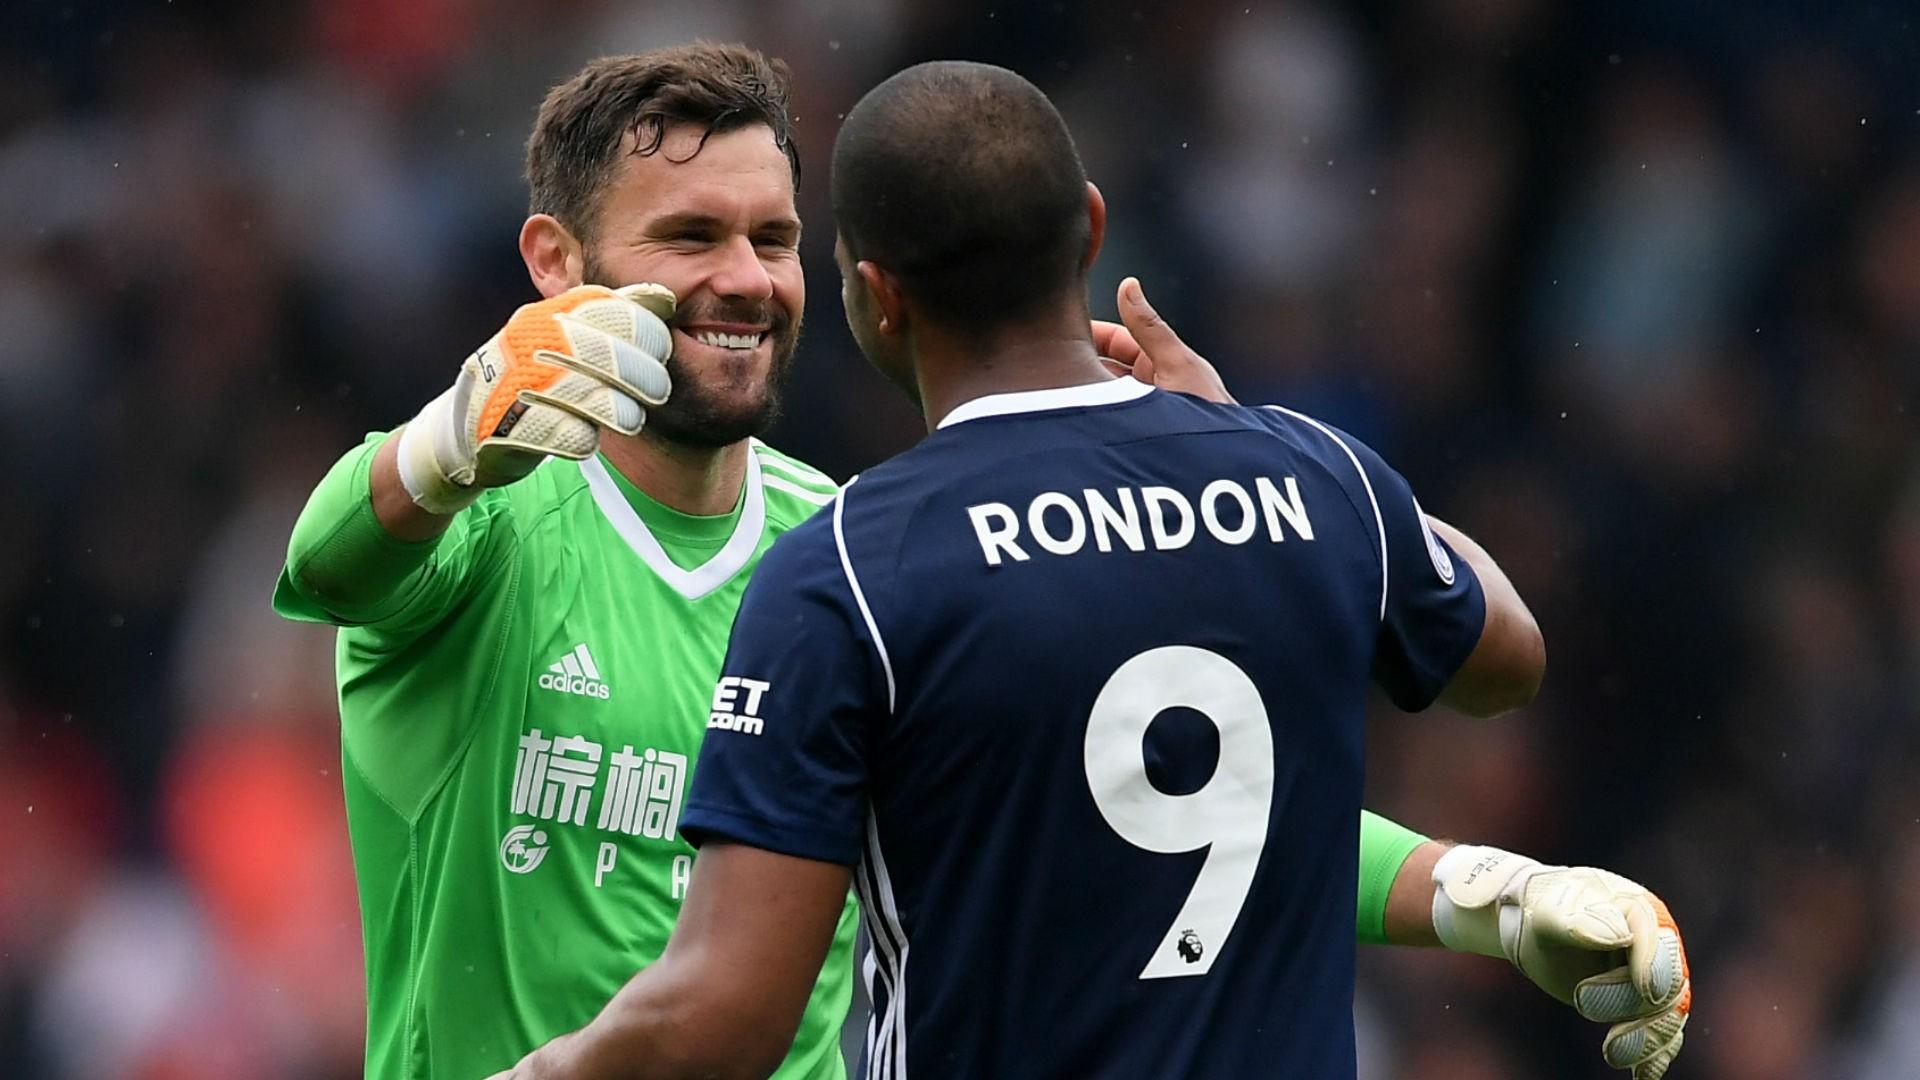 salomon rondon cropped 1t6m6czsp3zn71b0gtbie8tvc5 - VIDEO: West Brom 2-2 Liverpool (Premier League) Highlights